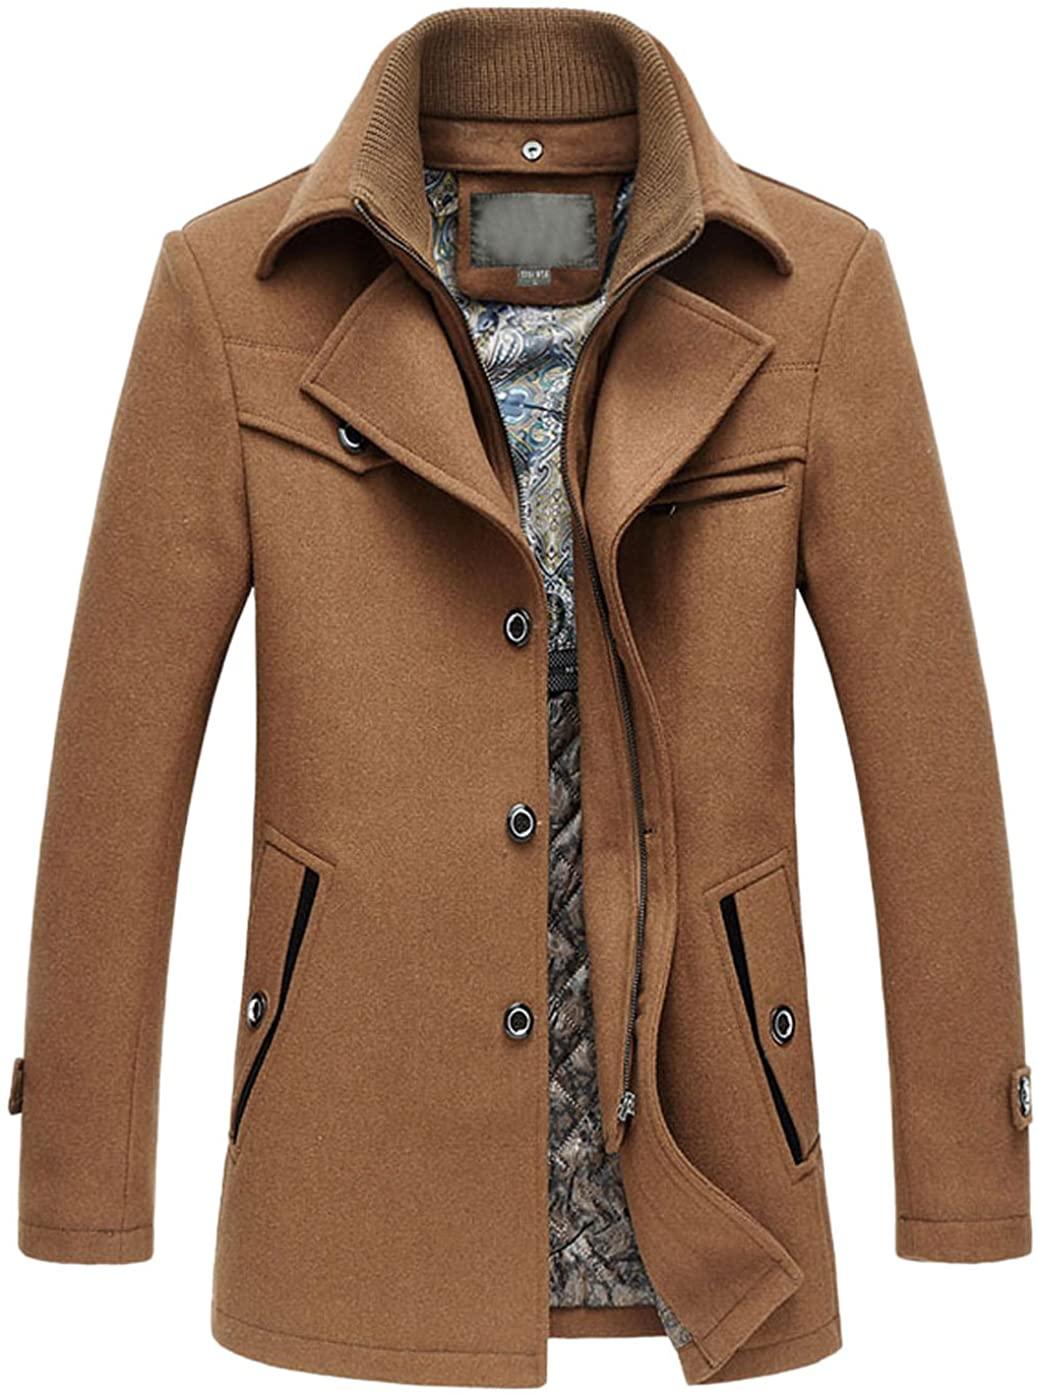 chouyatou Men's Winter Stylish Single Breasted Wool Blend Pea Coat with Detachable Bib